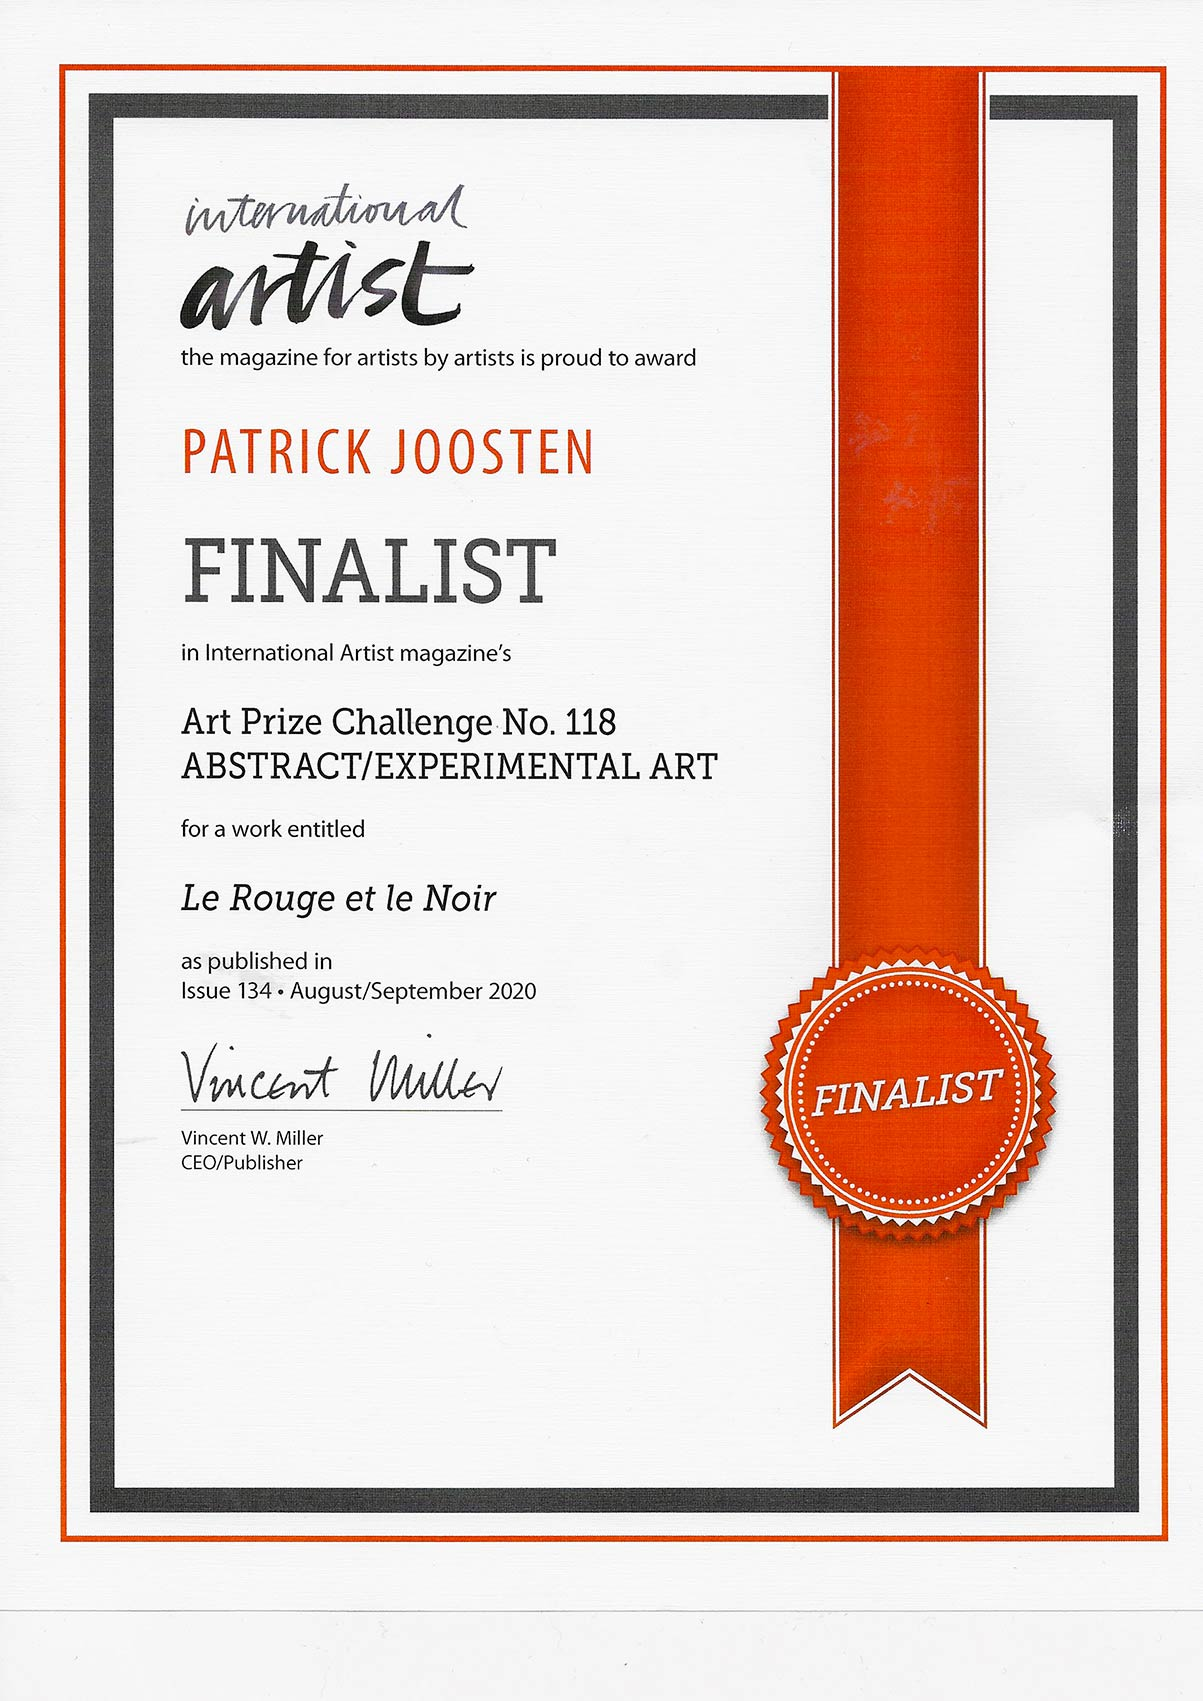 2020-07-29_International-Artist-finalist-Patrick-Joosten-LR